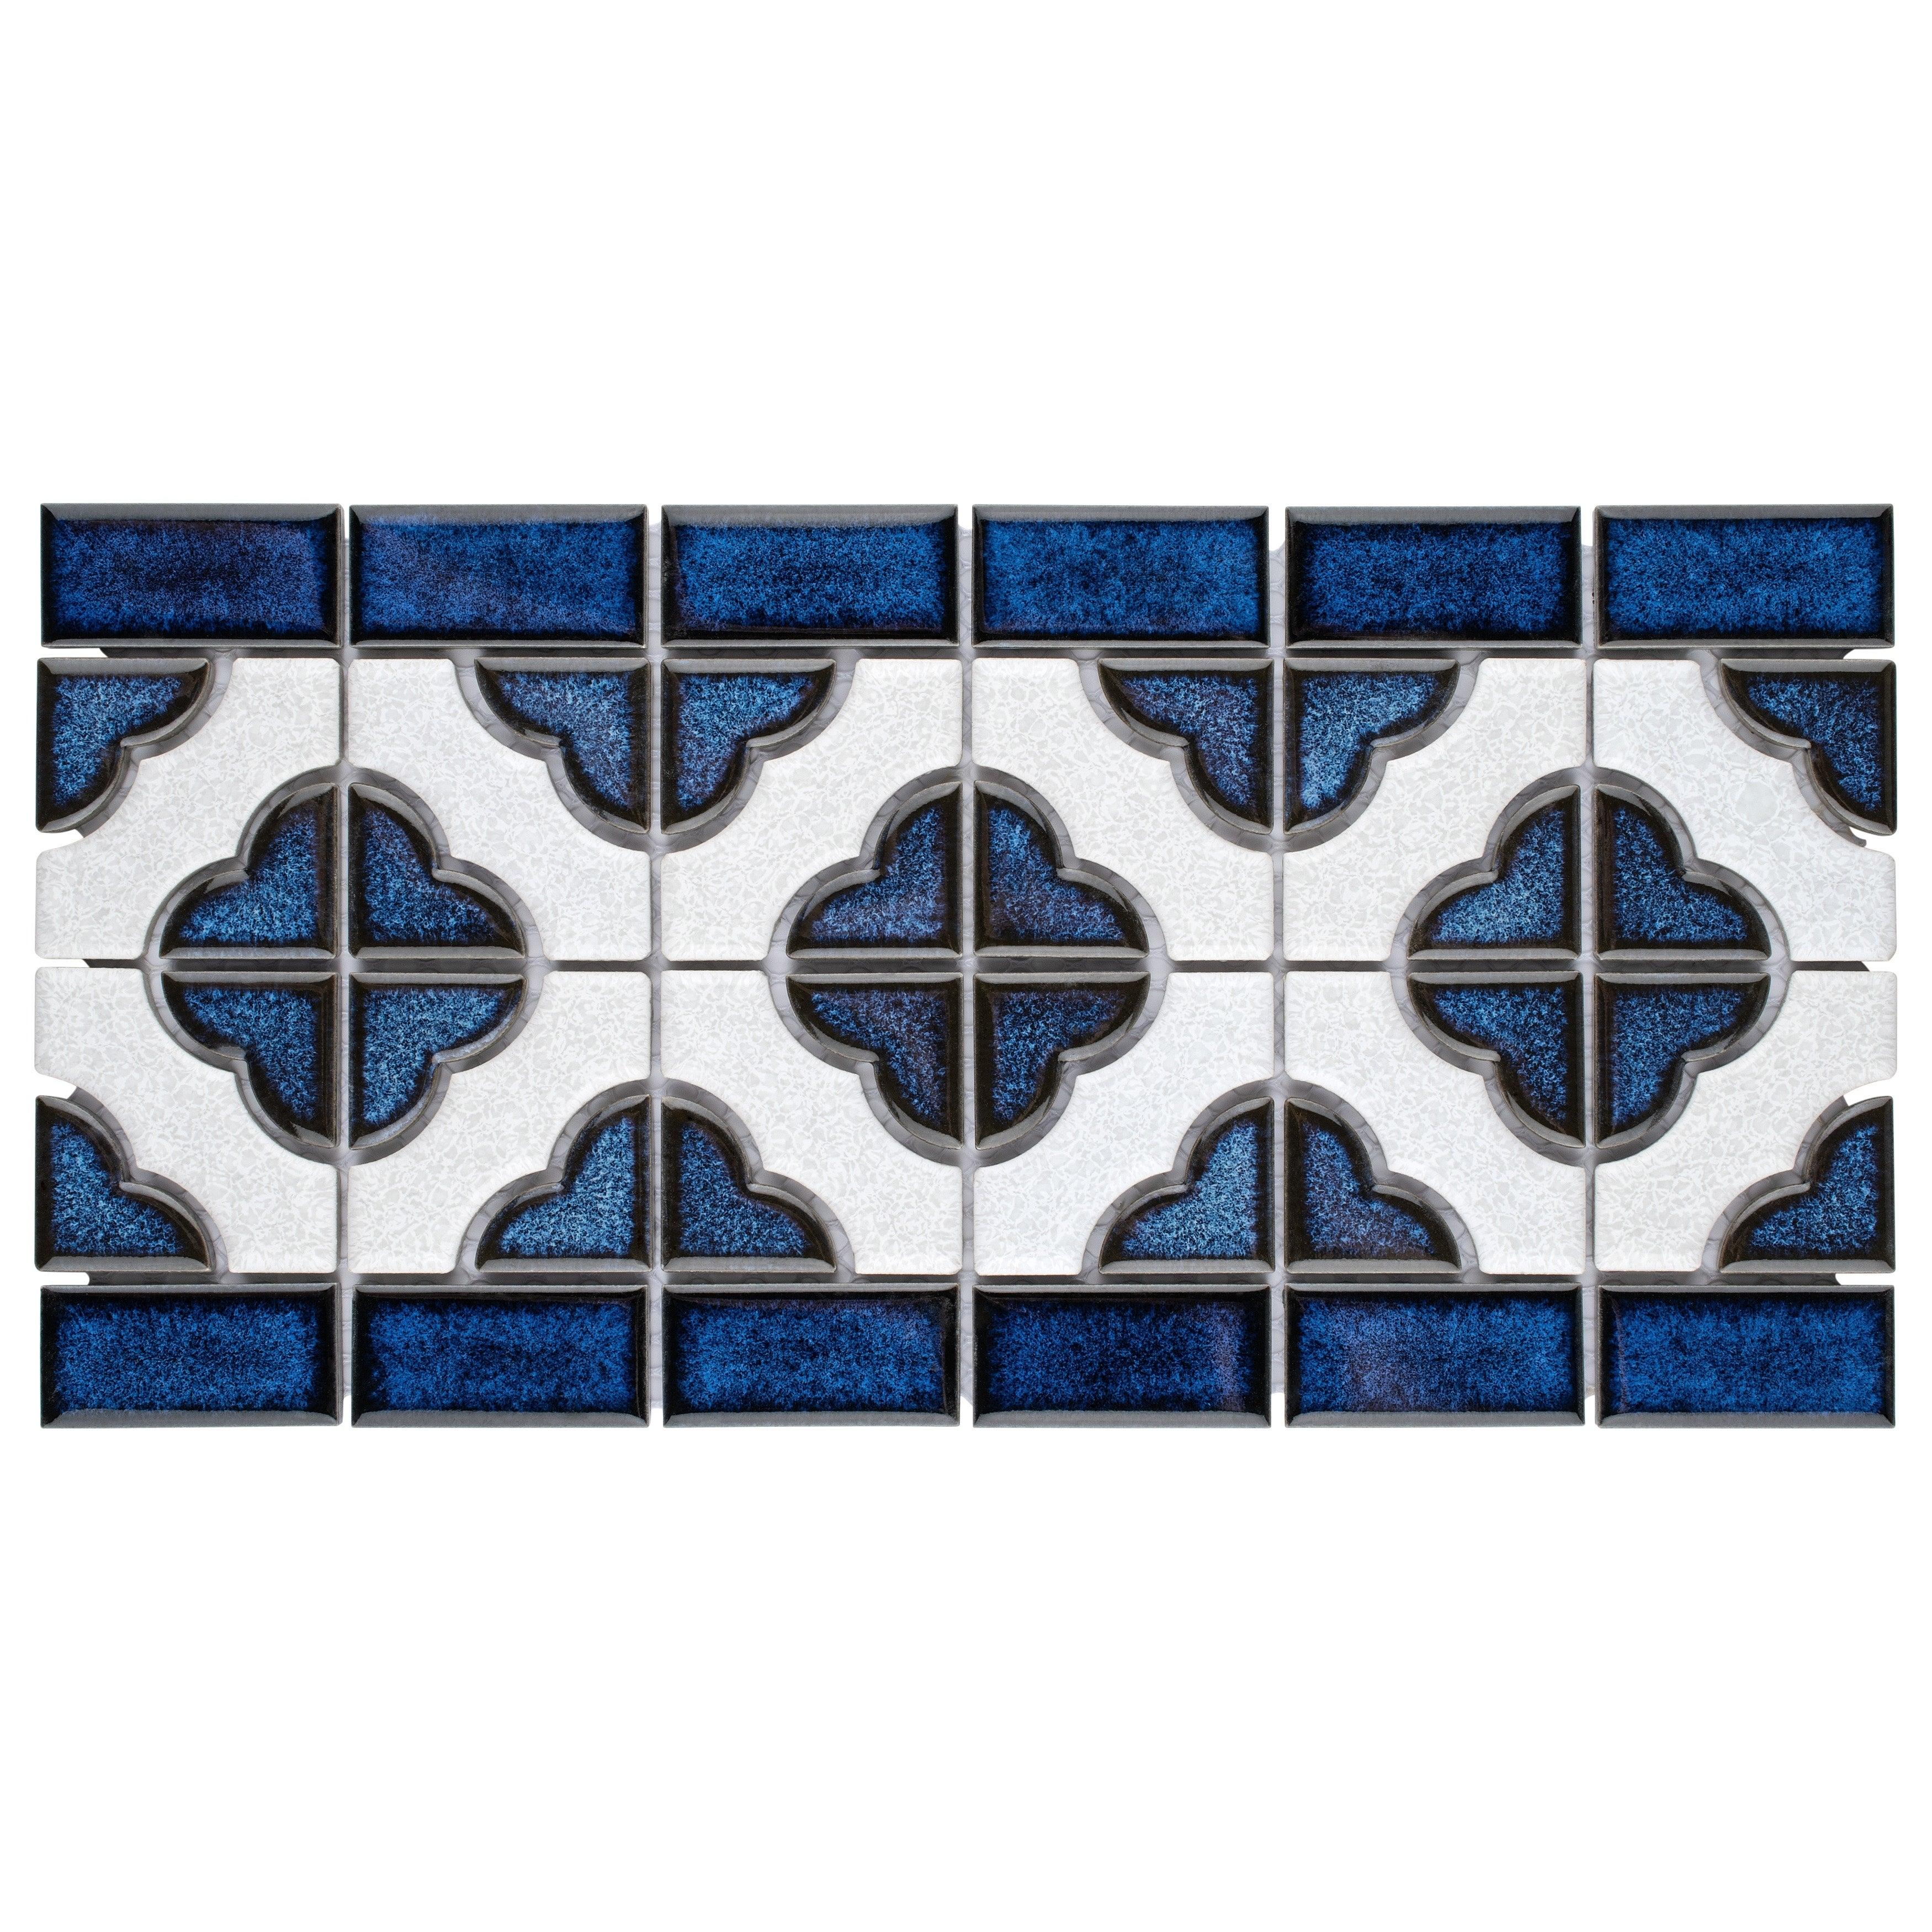 Somertile Castle Cobalt/ White Border Porcelain Mosaic Ti...